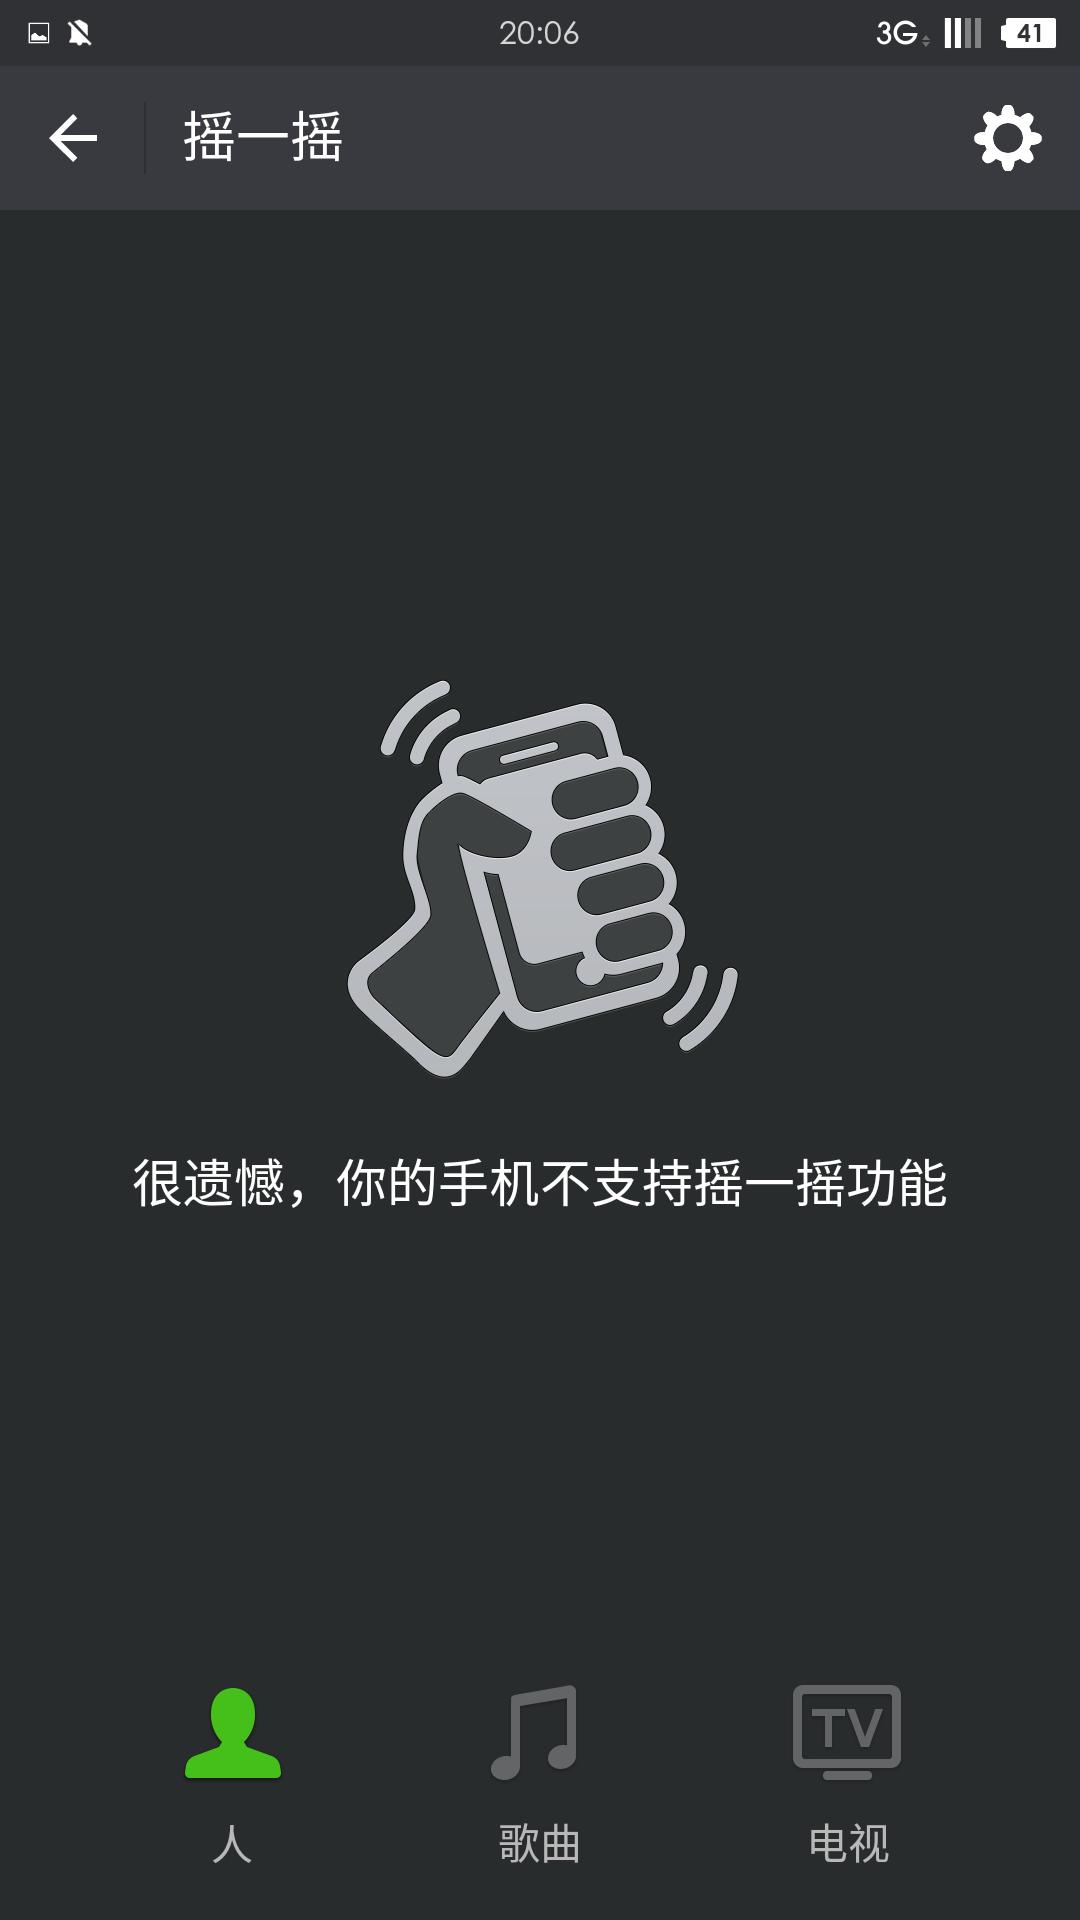 Screenshot_2017-12-07-20-06-45.png